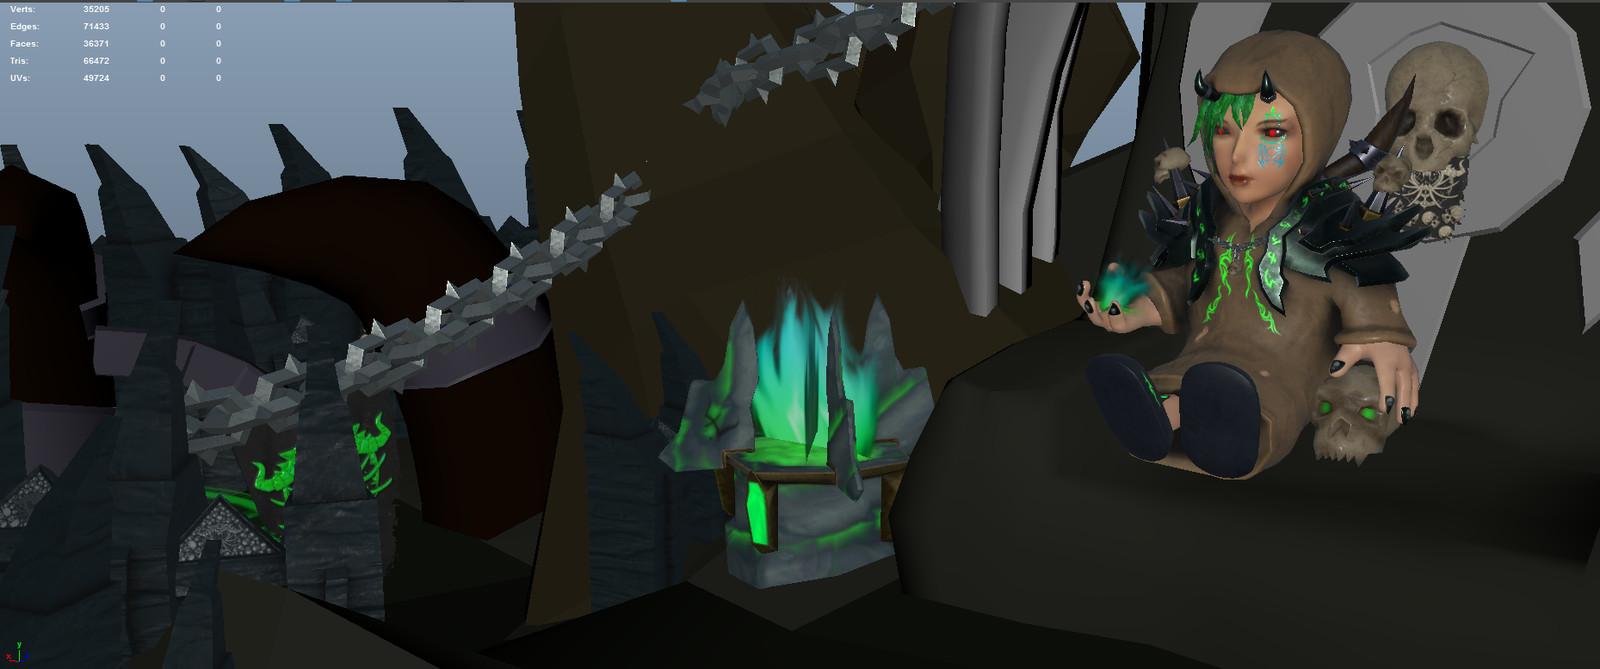 In scene with update